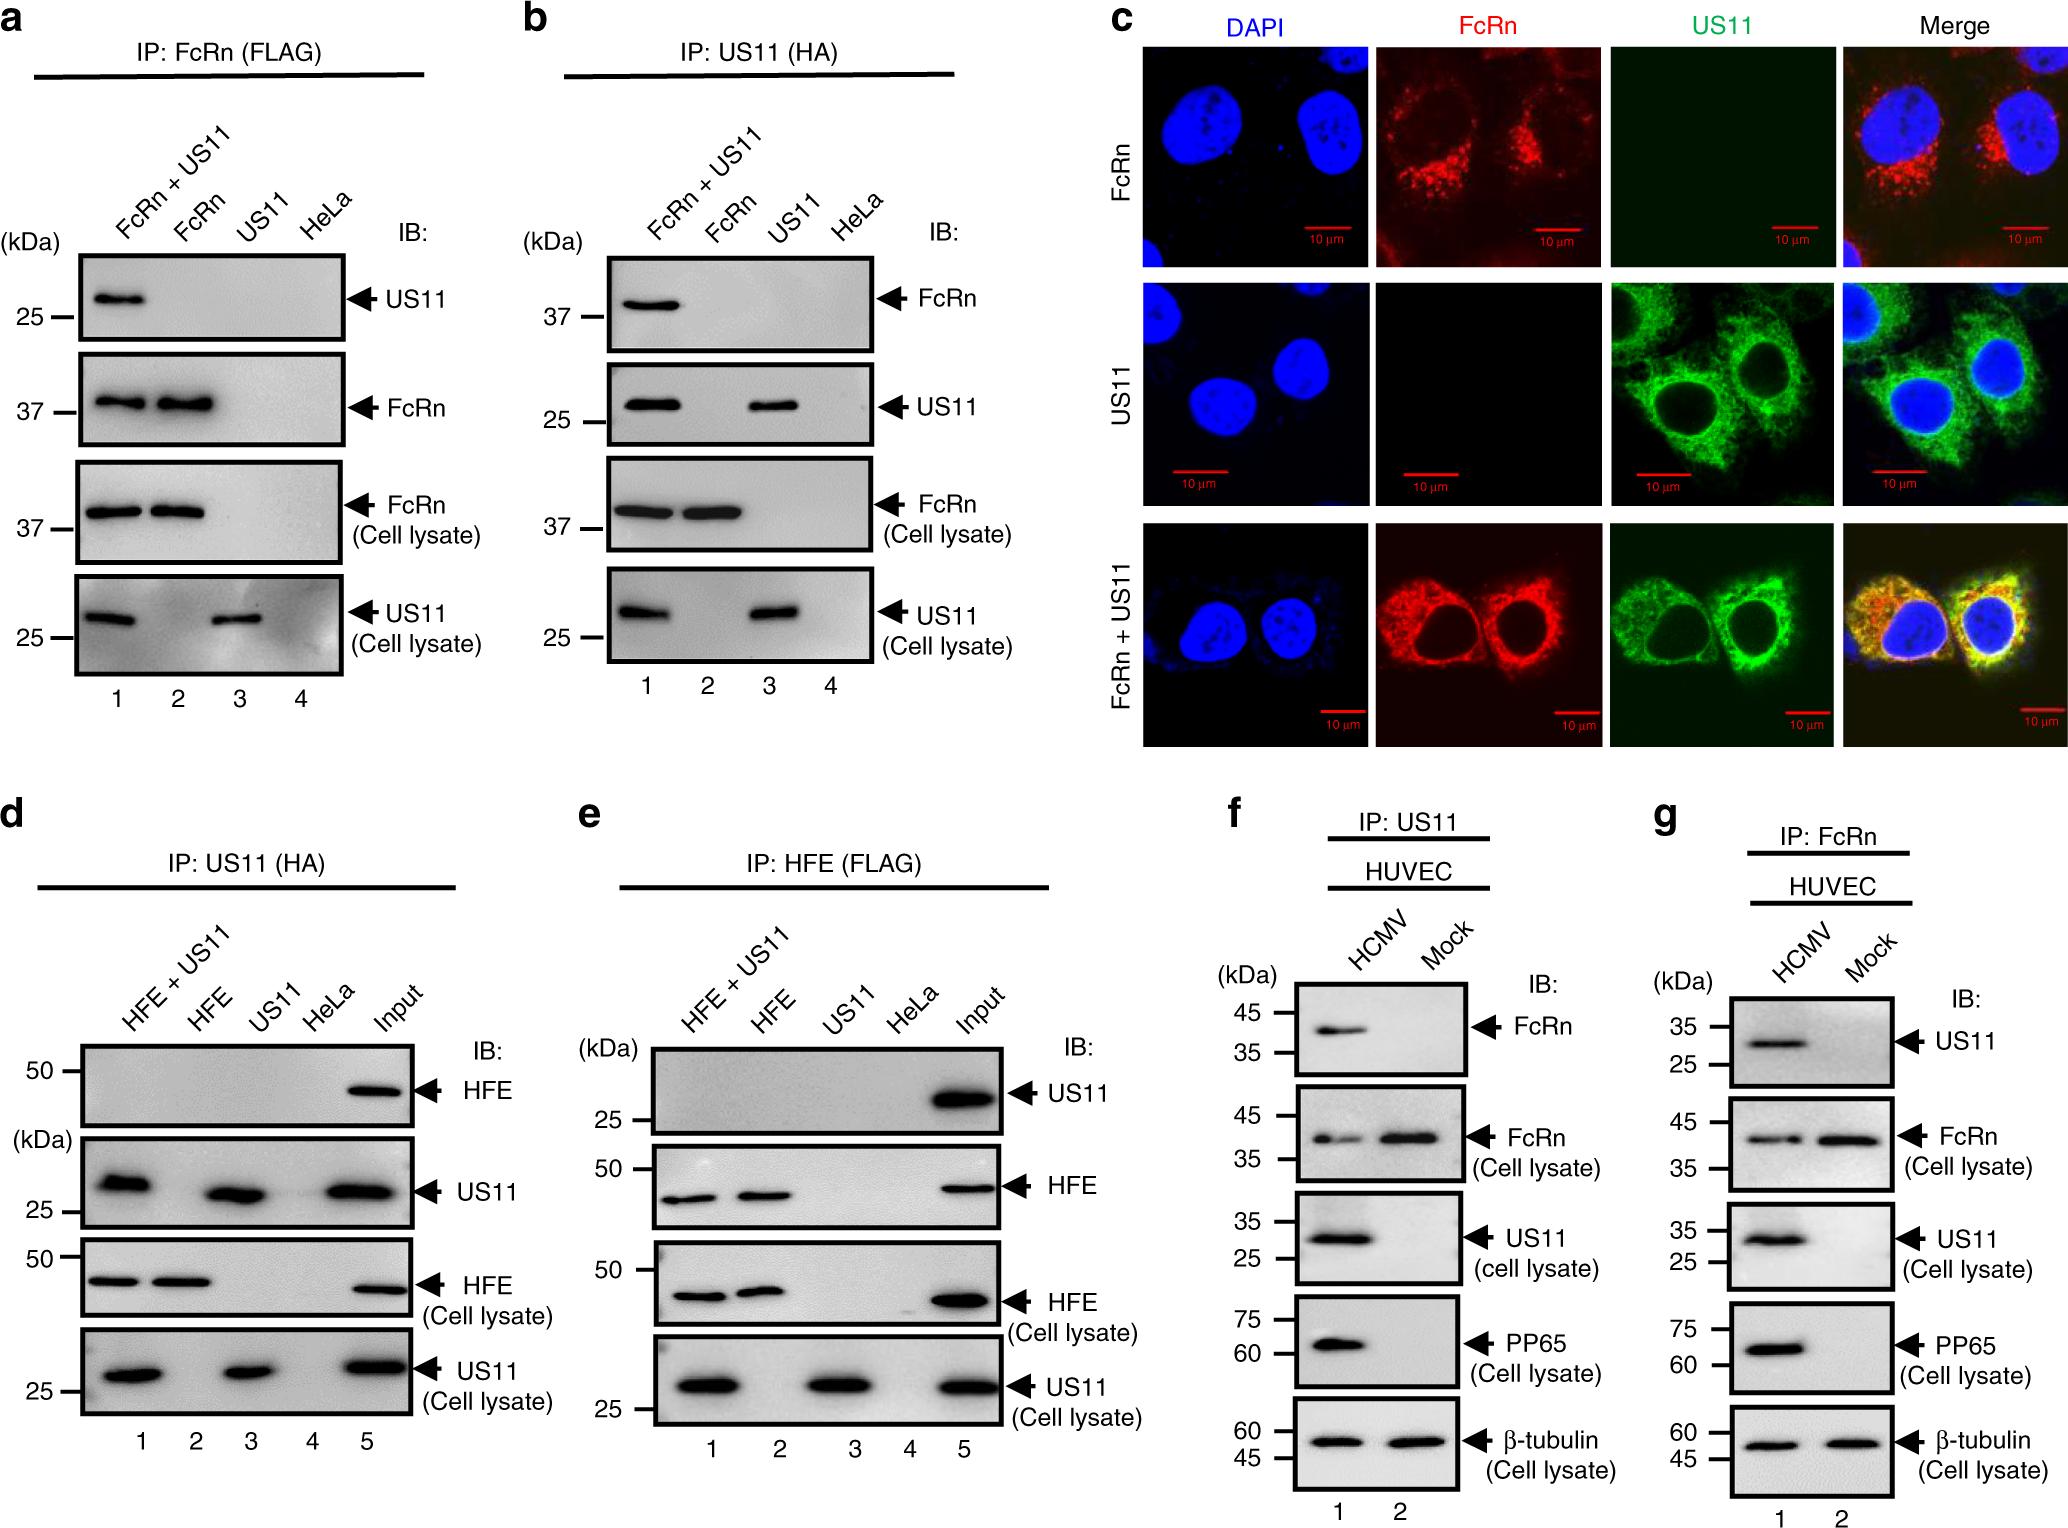 Human cytomegalovirus evades antibody-mediated immunity